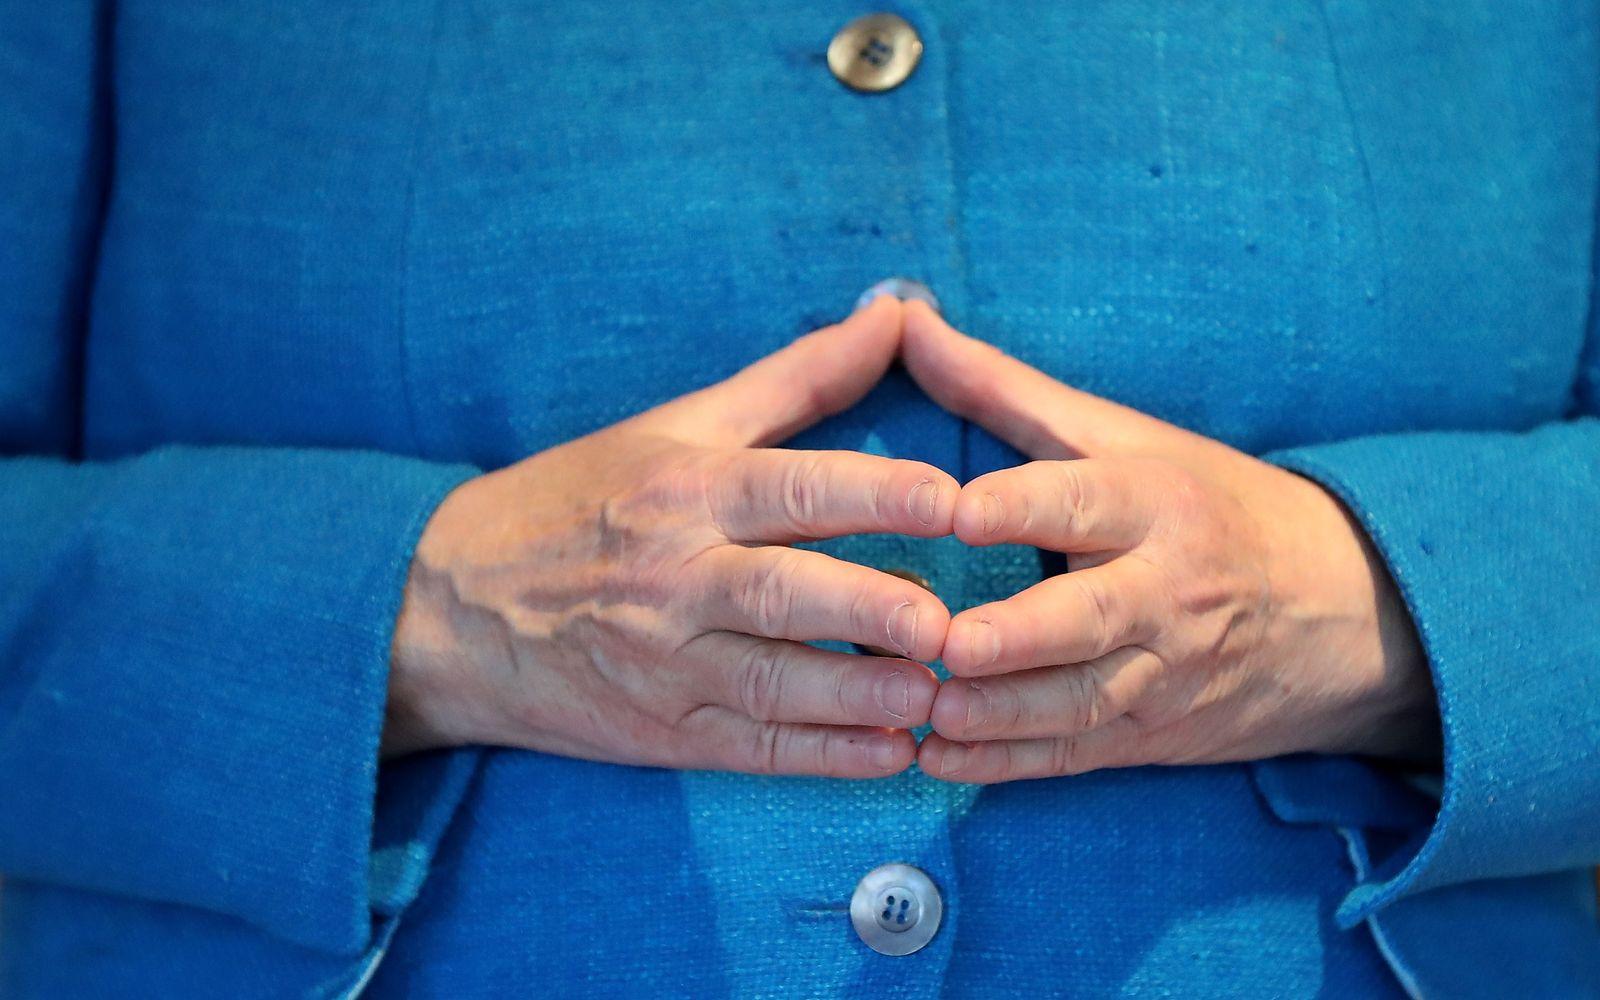 German Chancellor Merkel visits the Duesseldorf Schauspielhaus theater